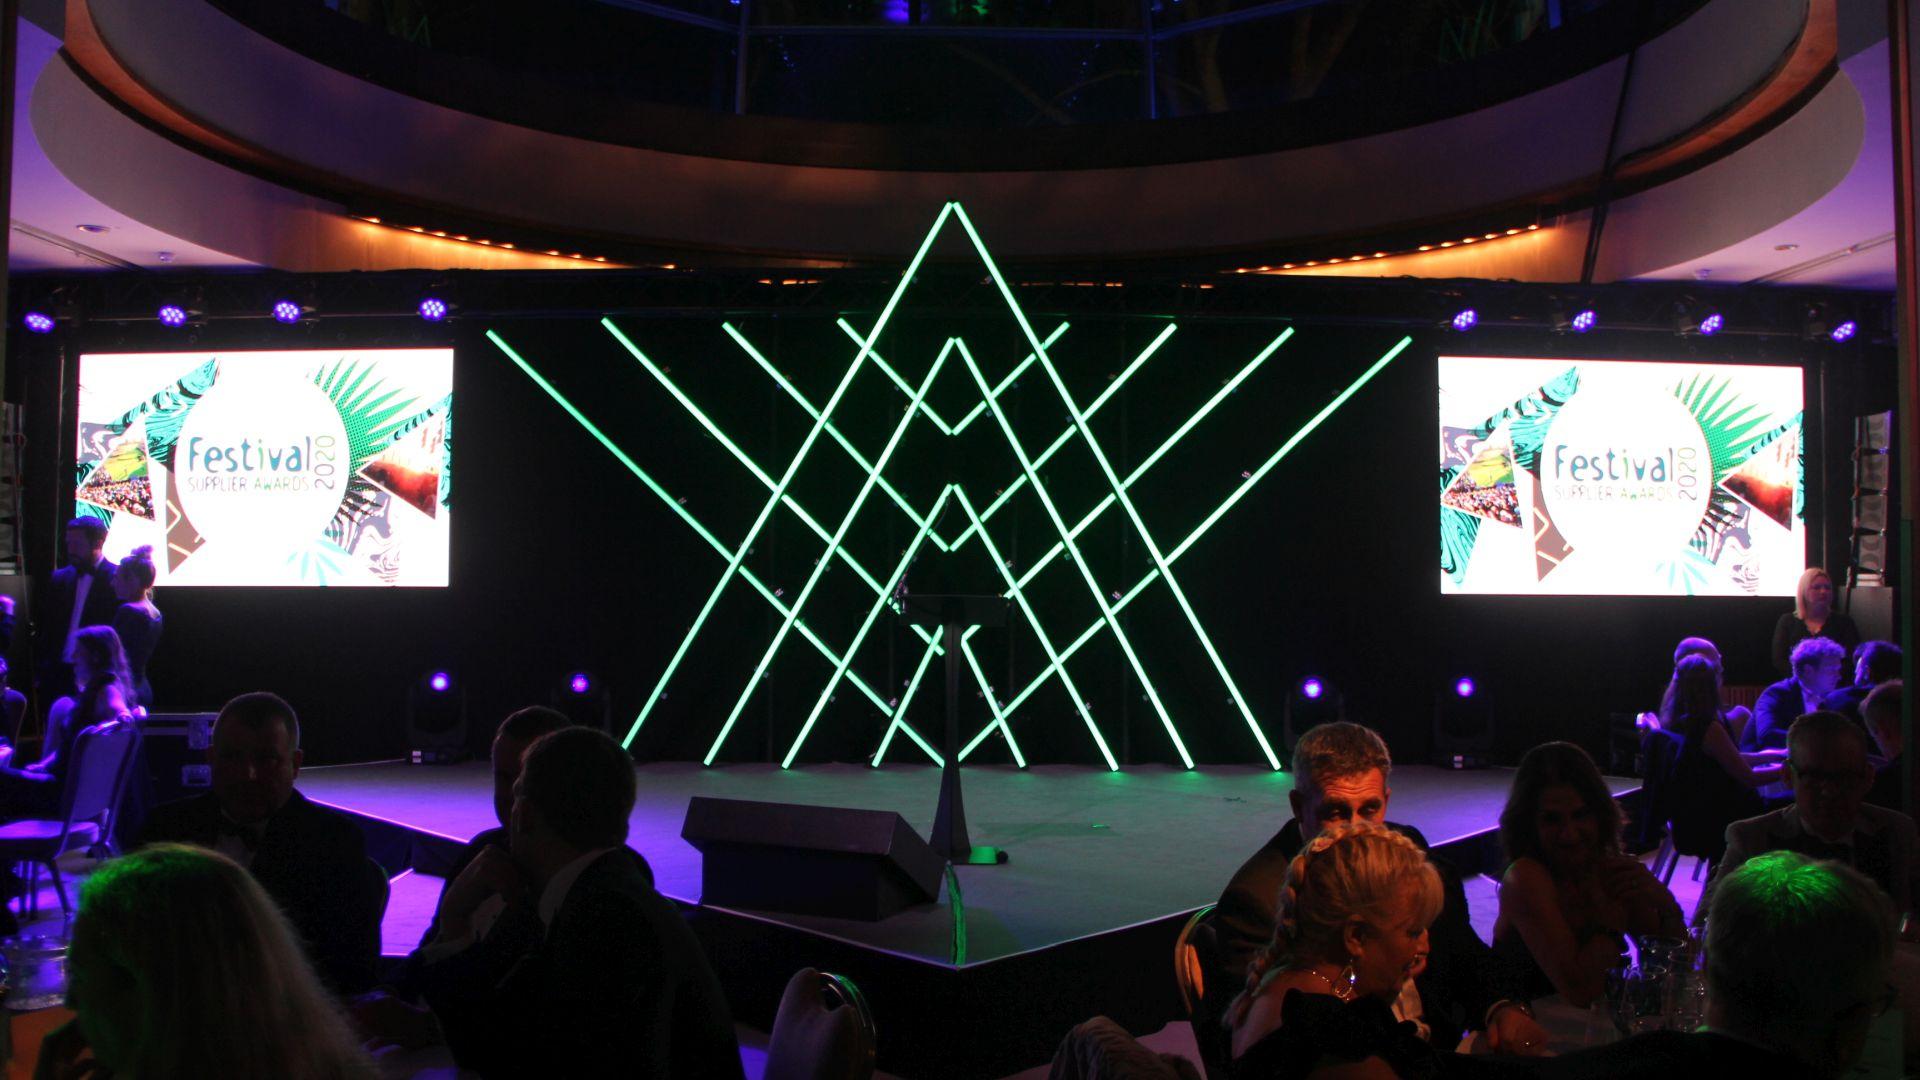 OneBigStar production for Festival Supplier Awards 2020